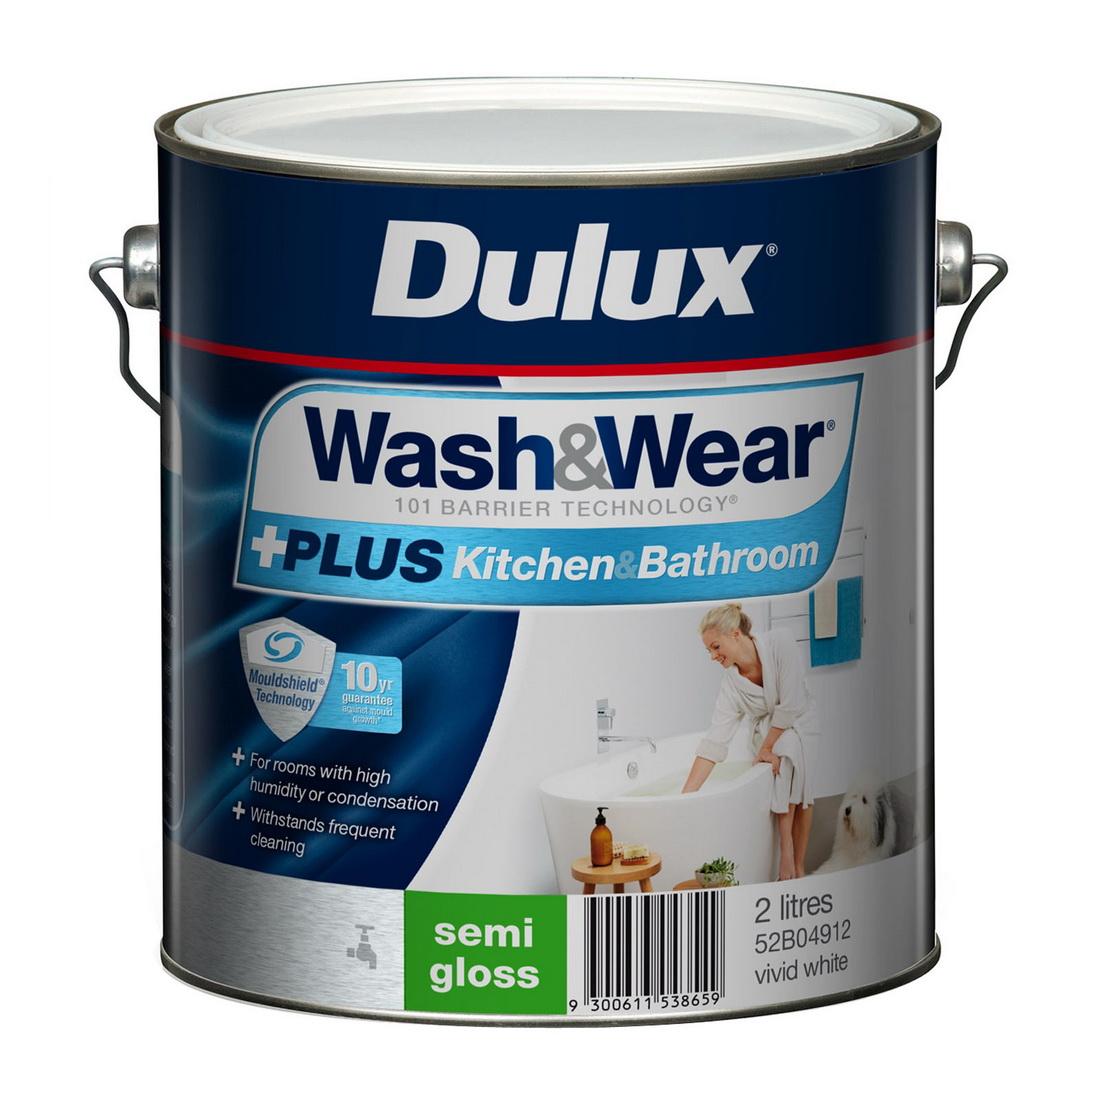 Wash&Wear +Plus Kitchen And Bathroom Semi Gloss Vivid White 2L